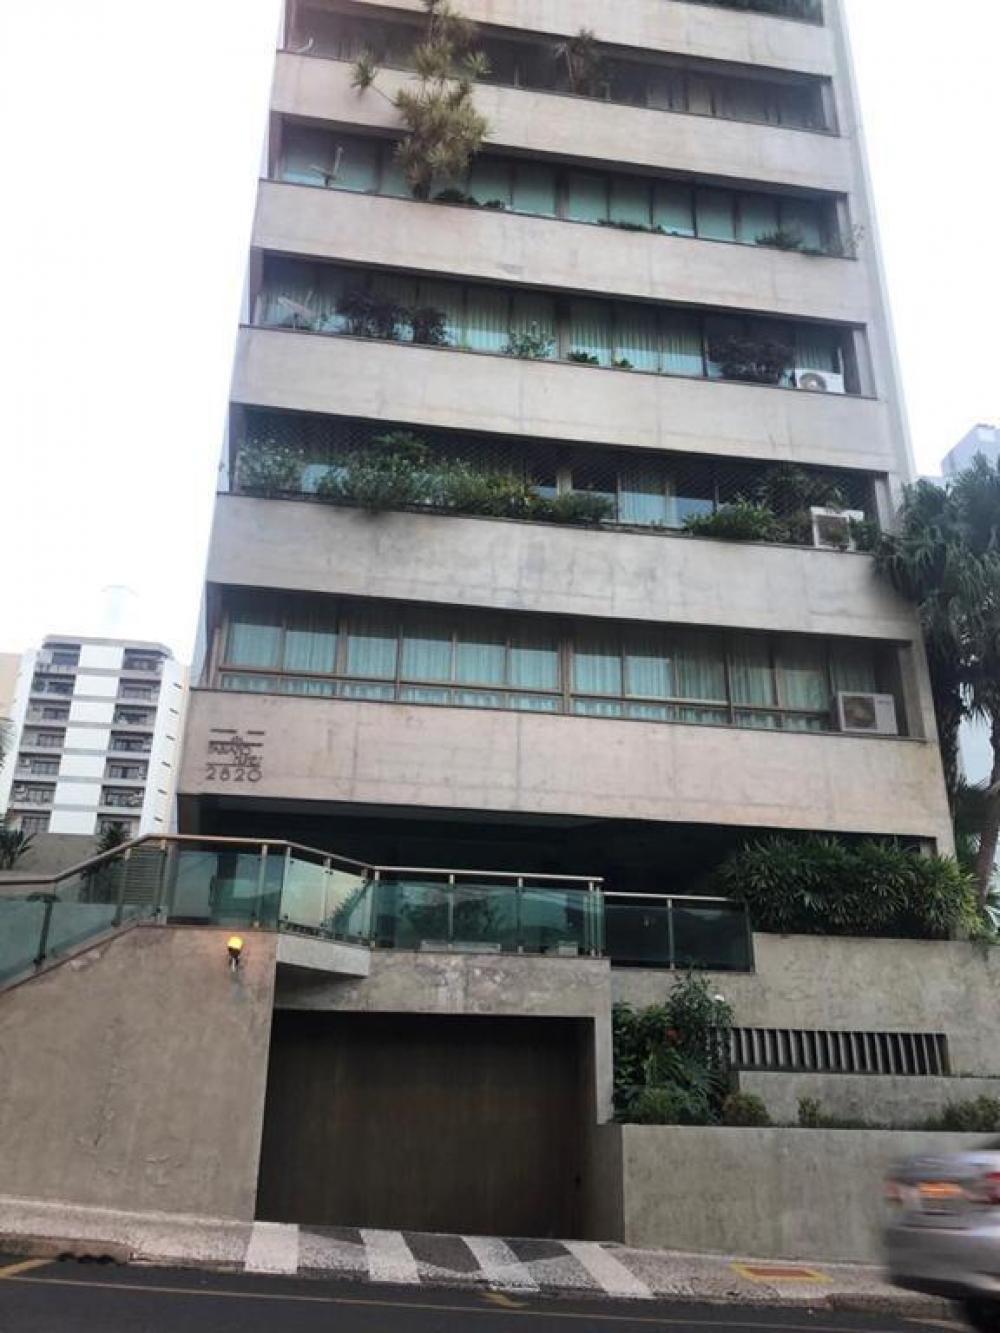 Sao Jose do Rio Preto Apartamento Venda R$450.000,00 Condominio R$2.000,00 3 Dormitorios 3 Suites Area construida 309.98m2